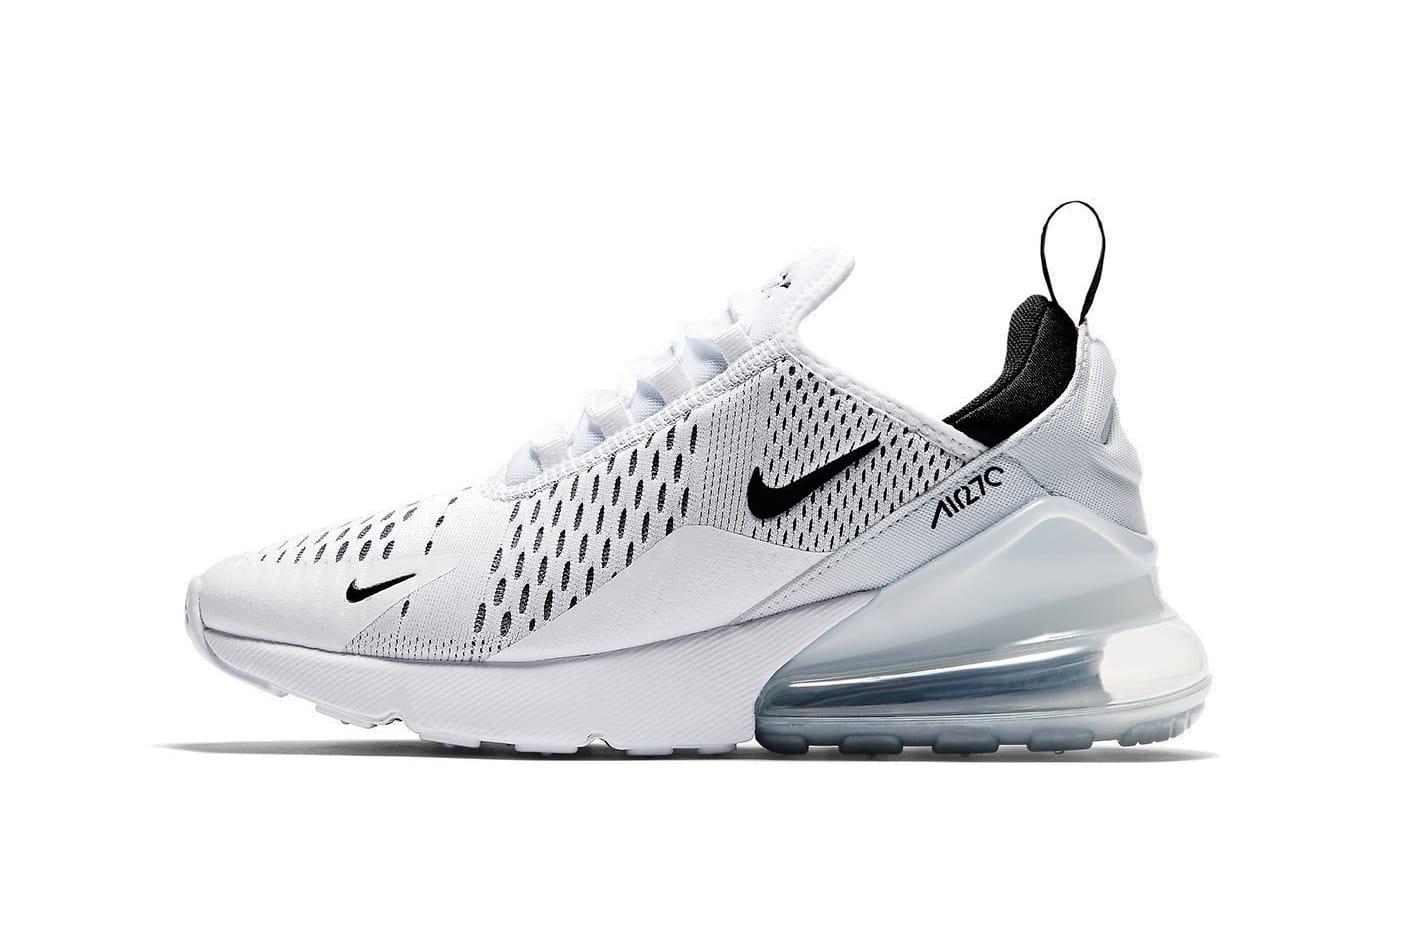 Nike Air Max 270 Women's White/Black